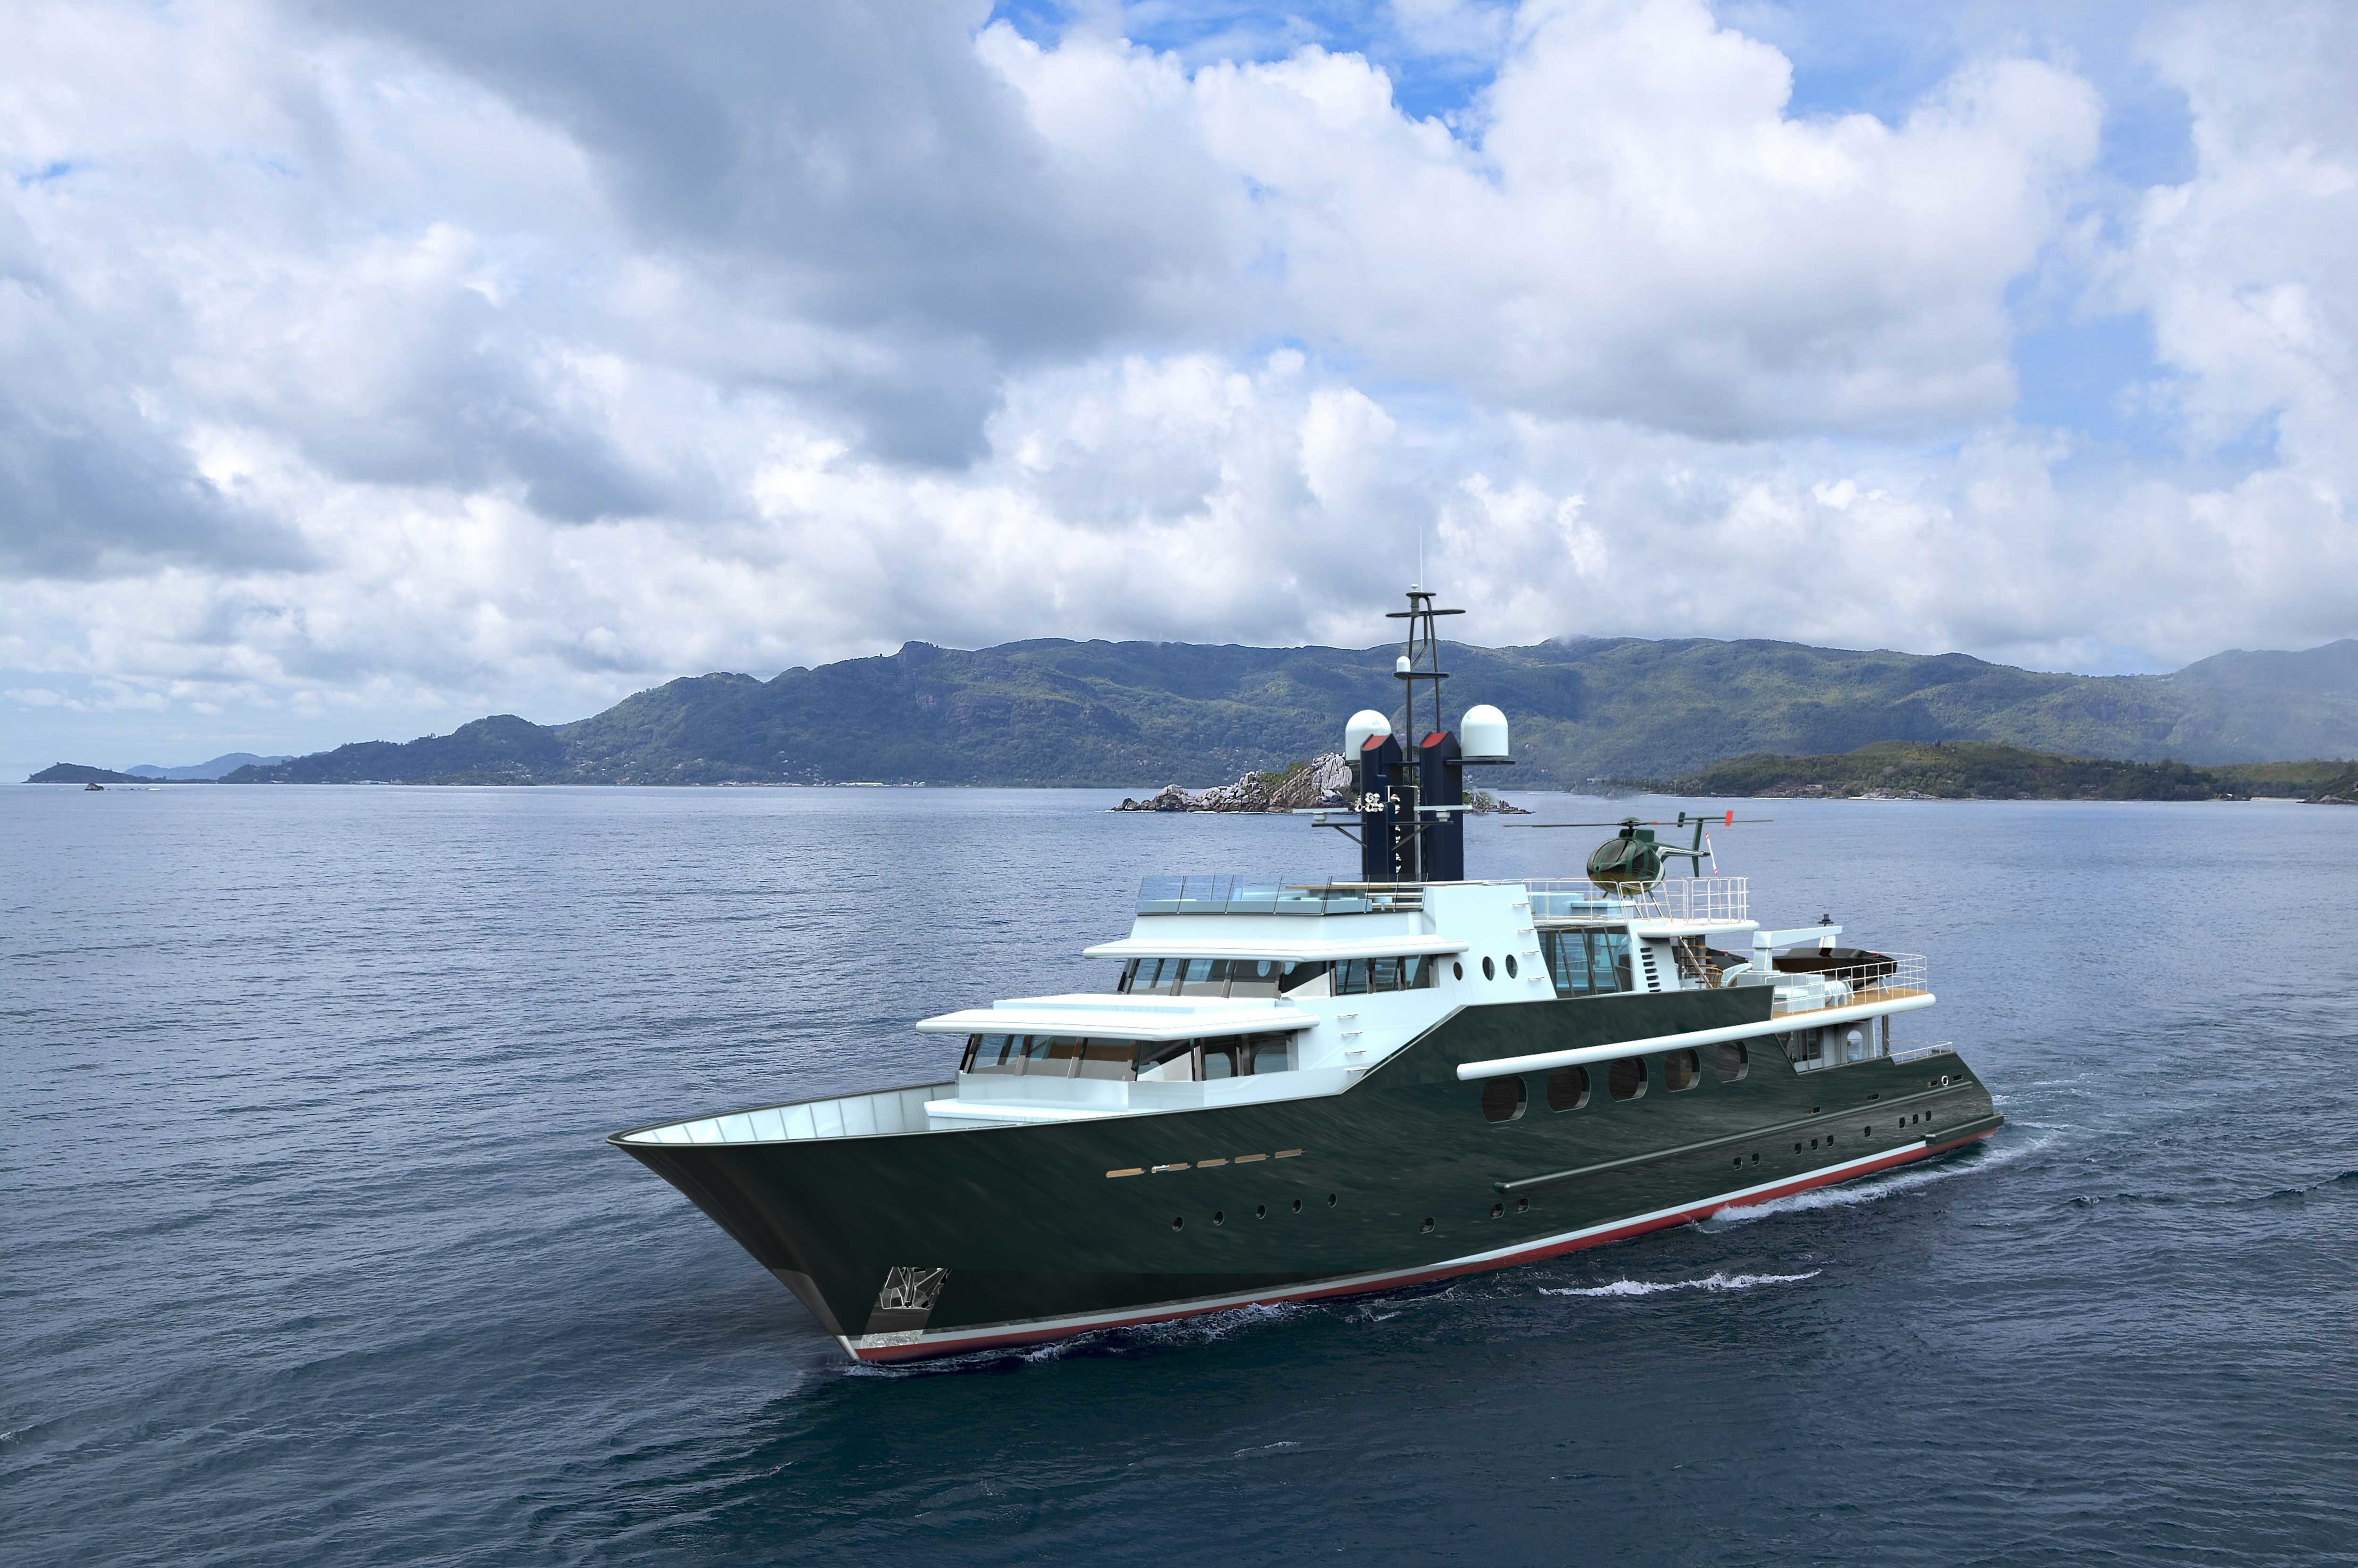 The 49m Yacht HIGHLANDER